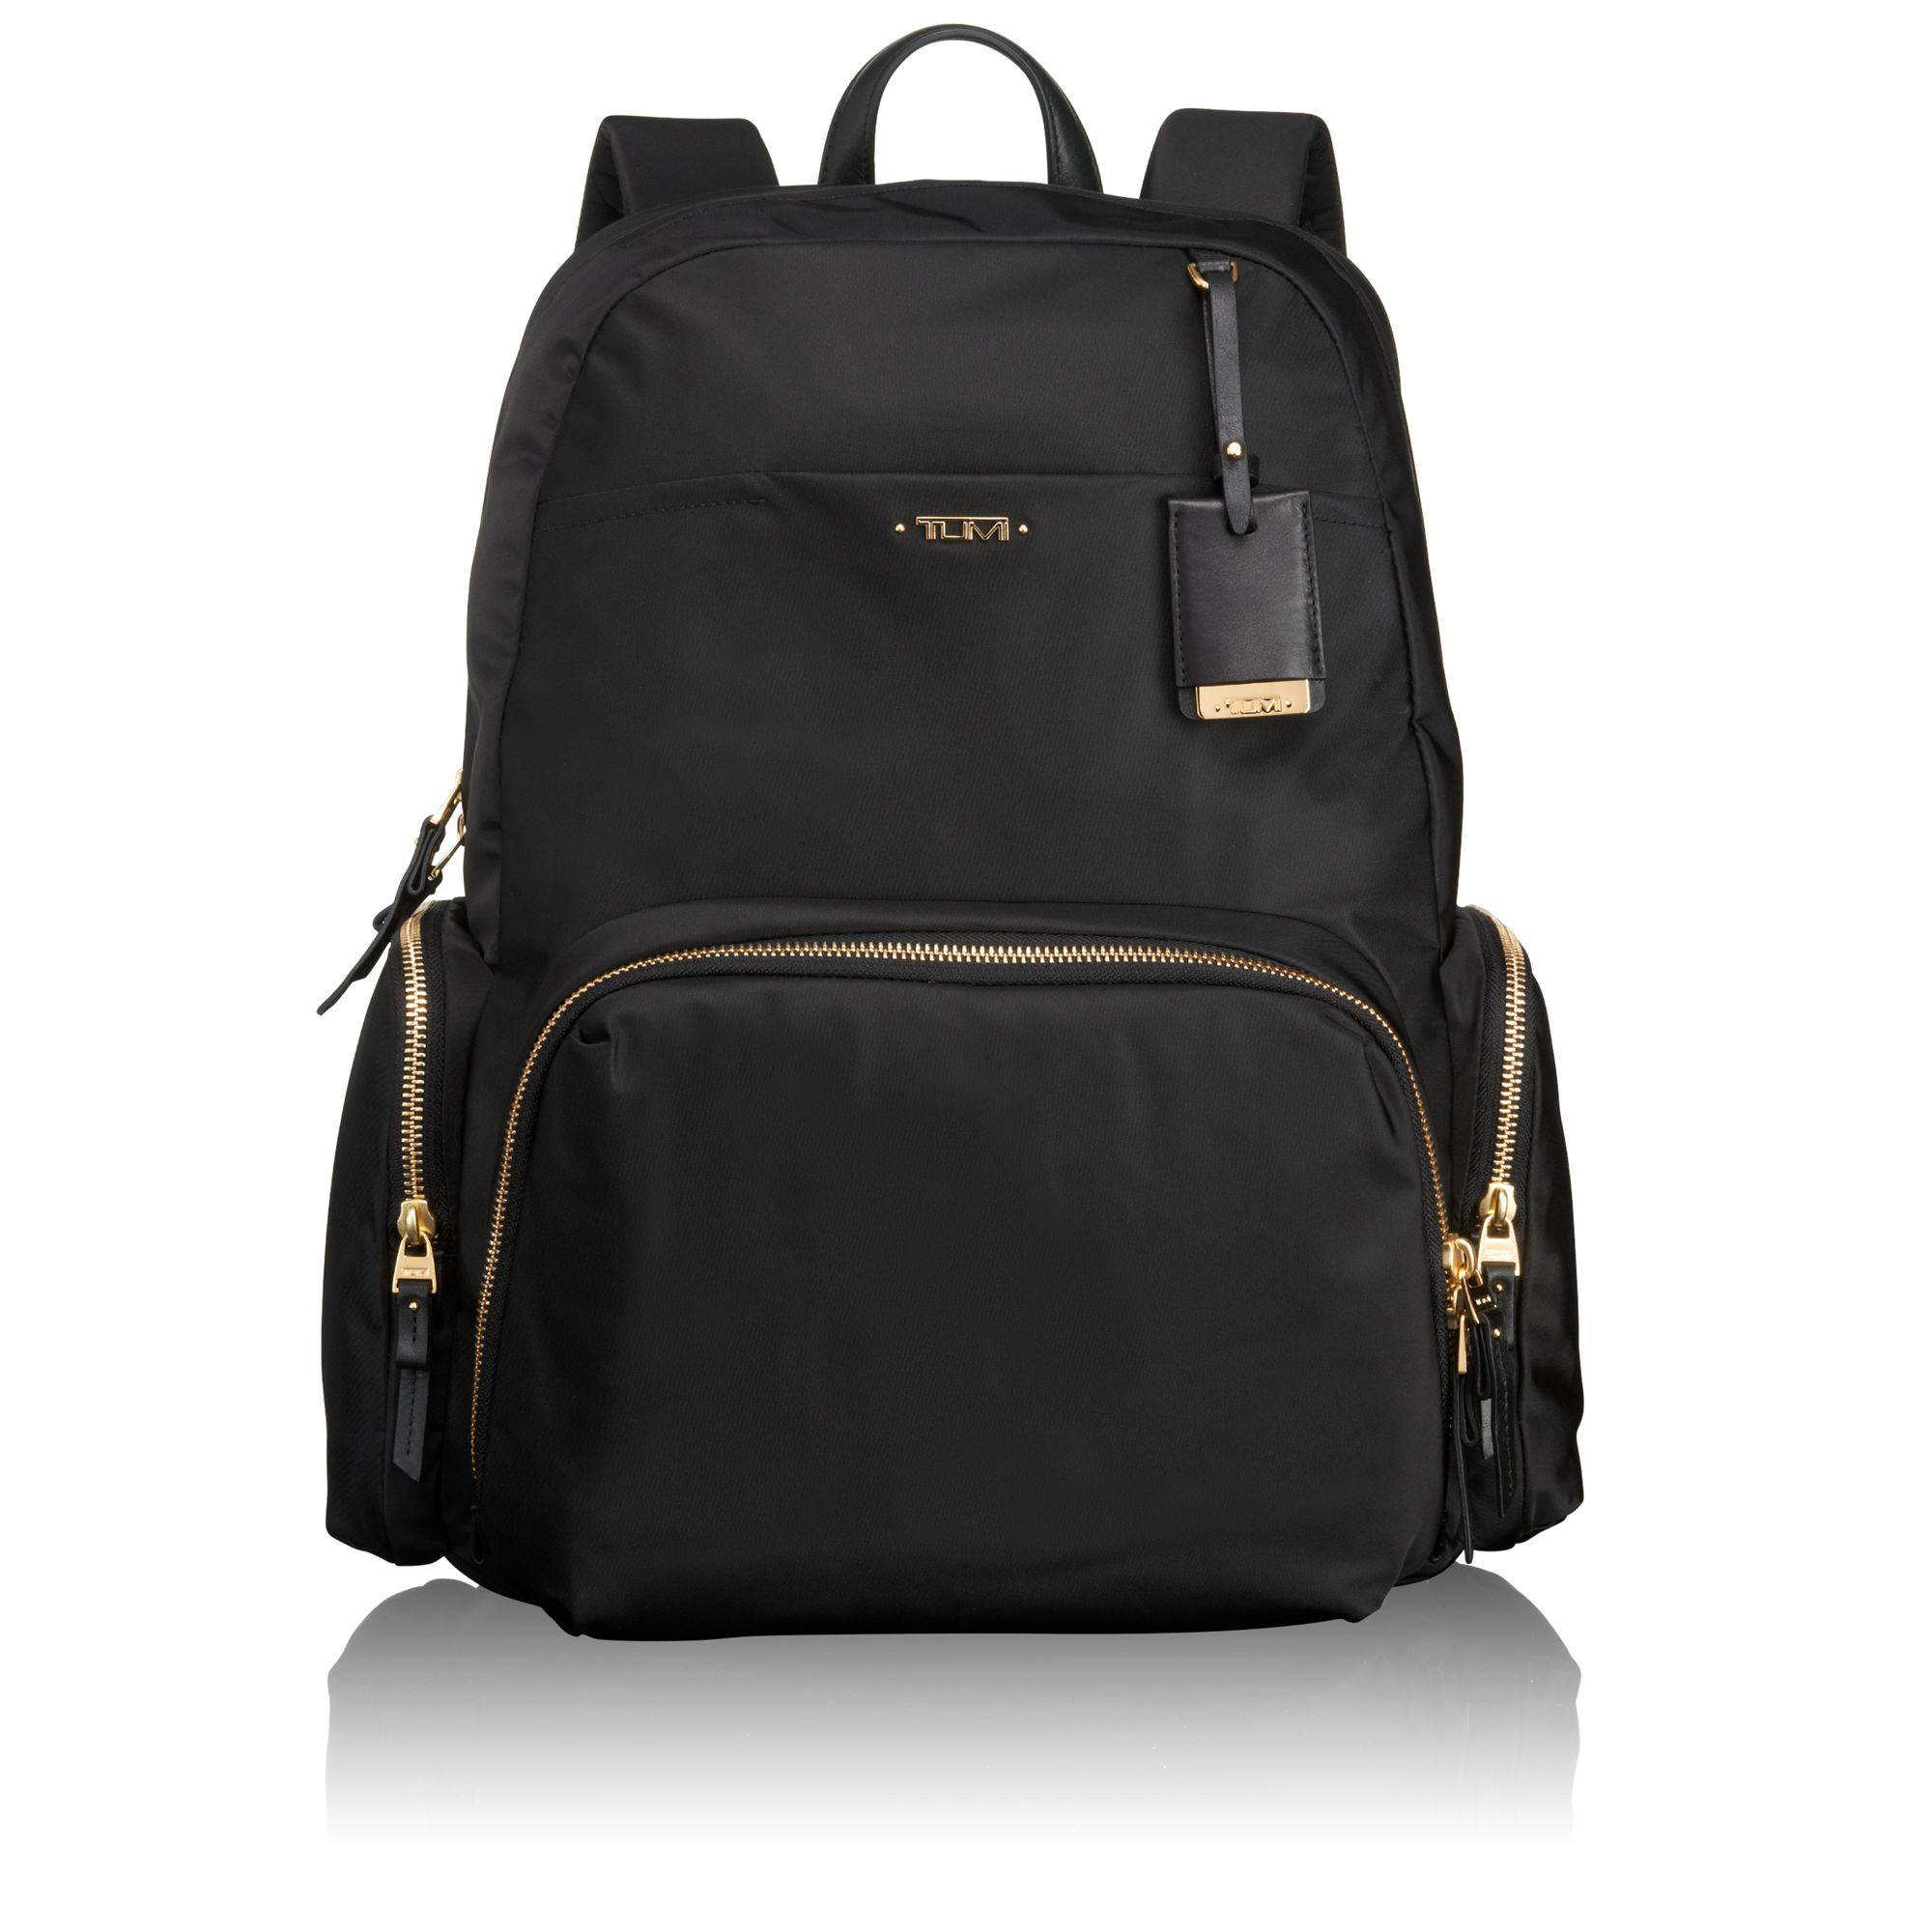 printed and backpack gabbana en gb harrods dolce drawstring com jaguar handbags